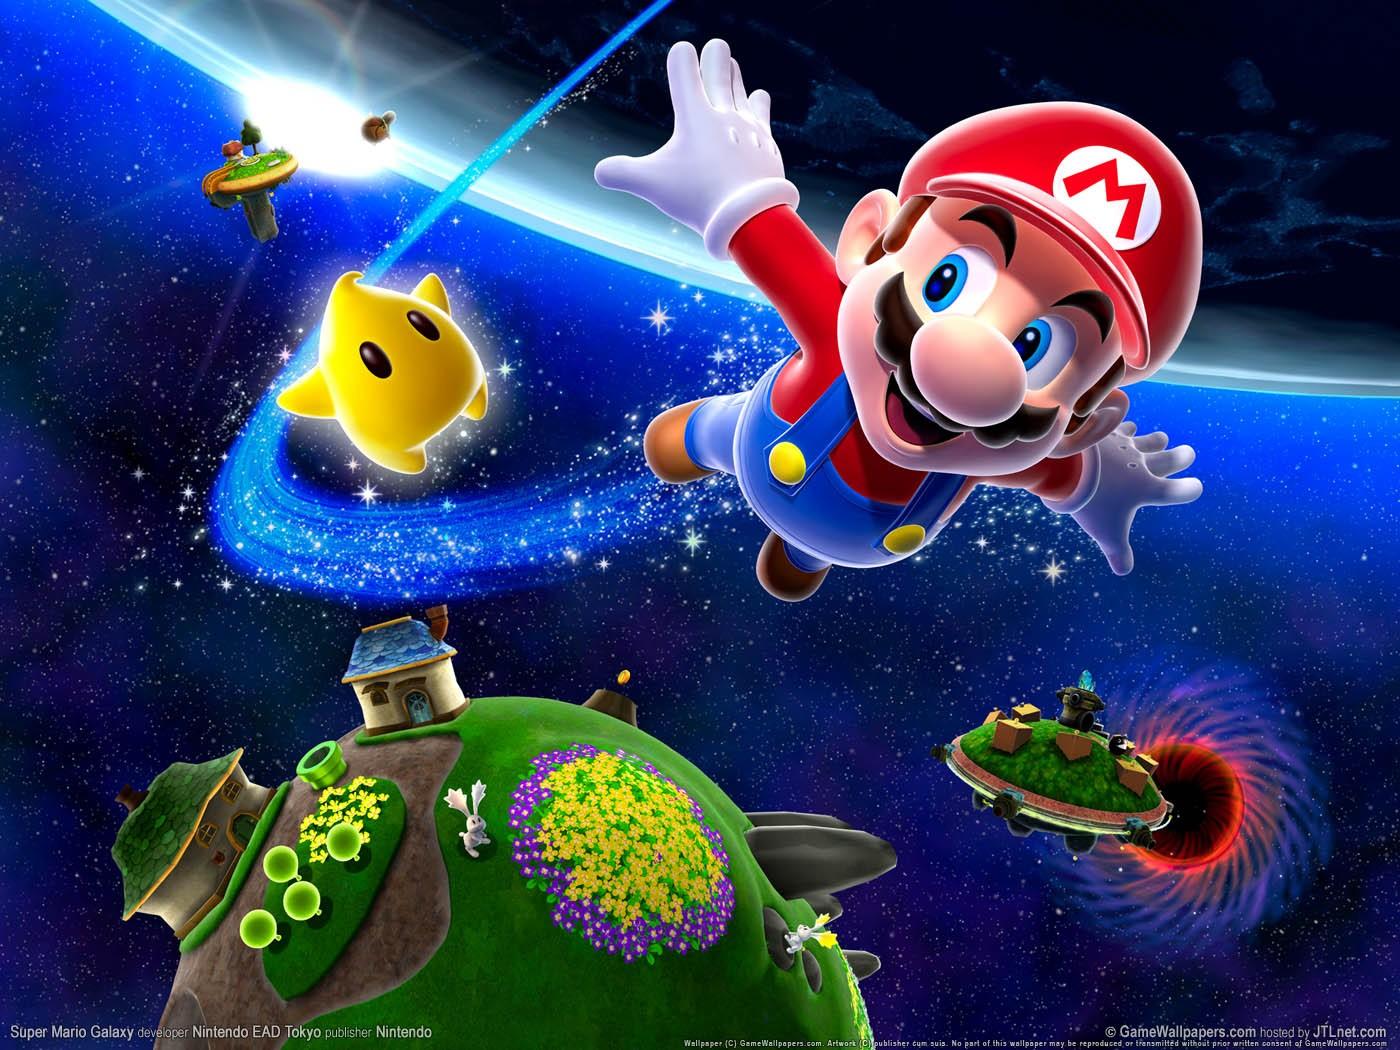 http://3.bp.blogspot.com/-SfCH3JRhsCM/UKHEYBI3SgI/AAAAAAAARgA/_NTDkjtZSVA/s1600/Mario+Galaxy.jpg